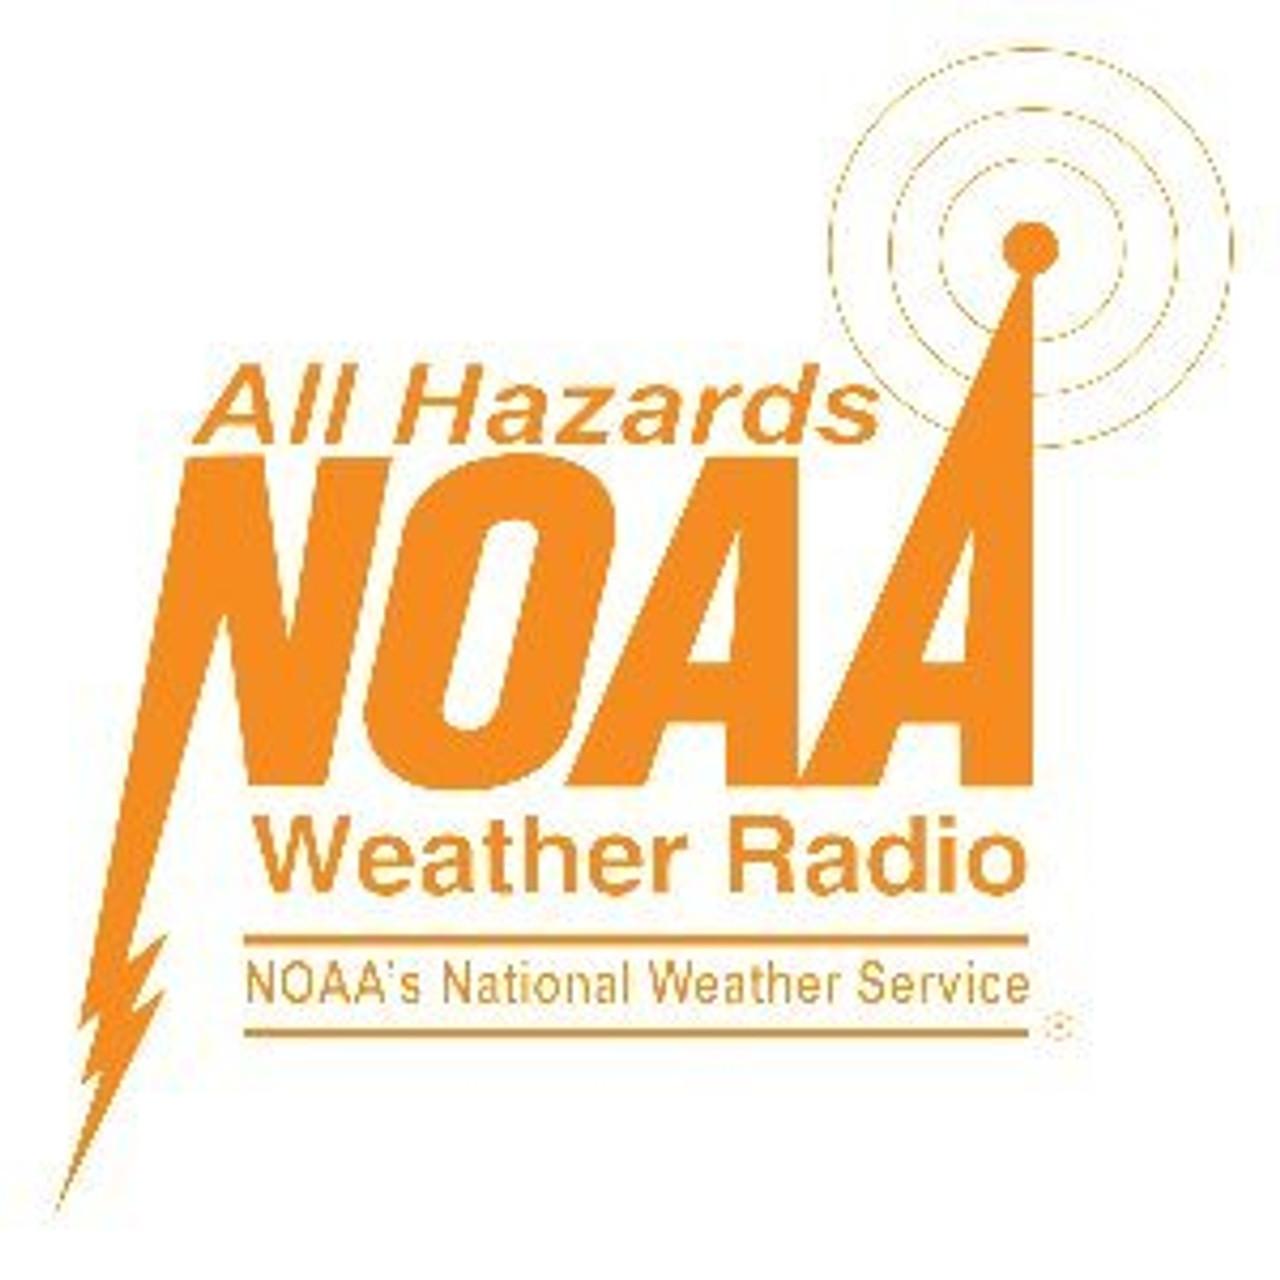 Motorola T402 Talkabout listens to NOAA Weather Alerts